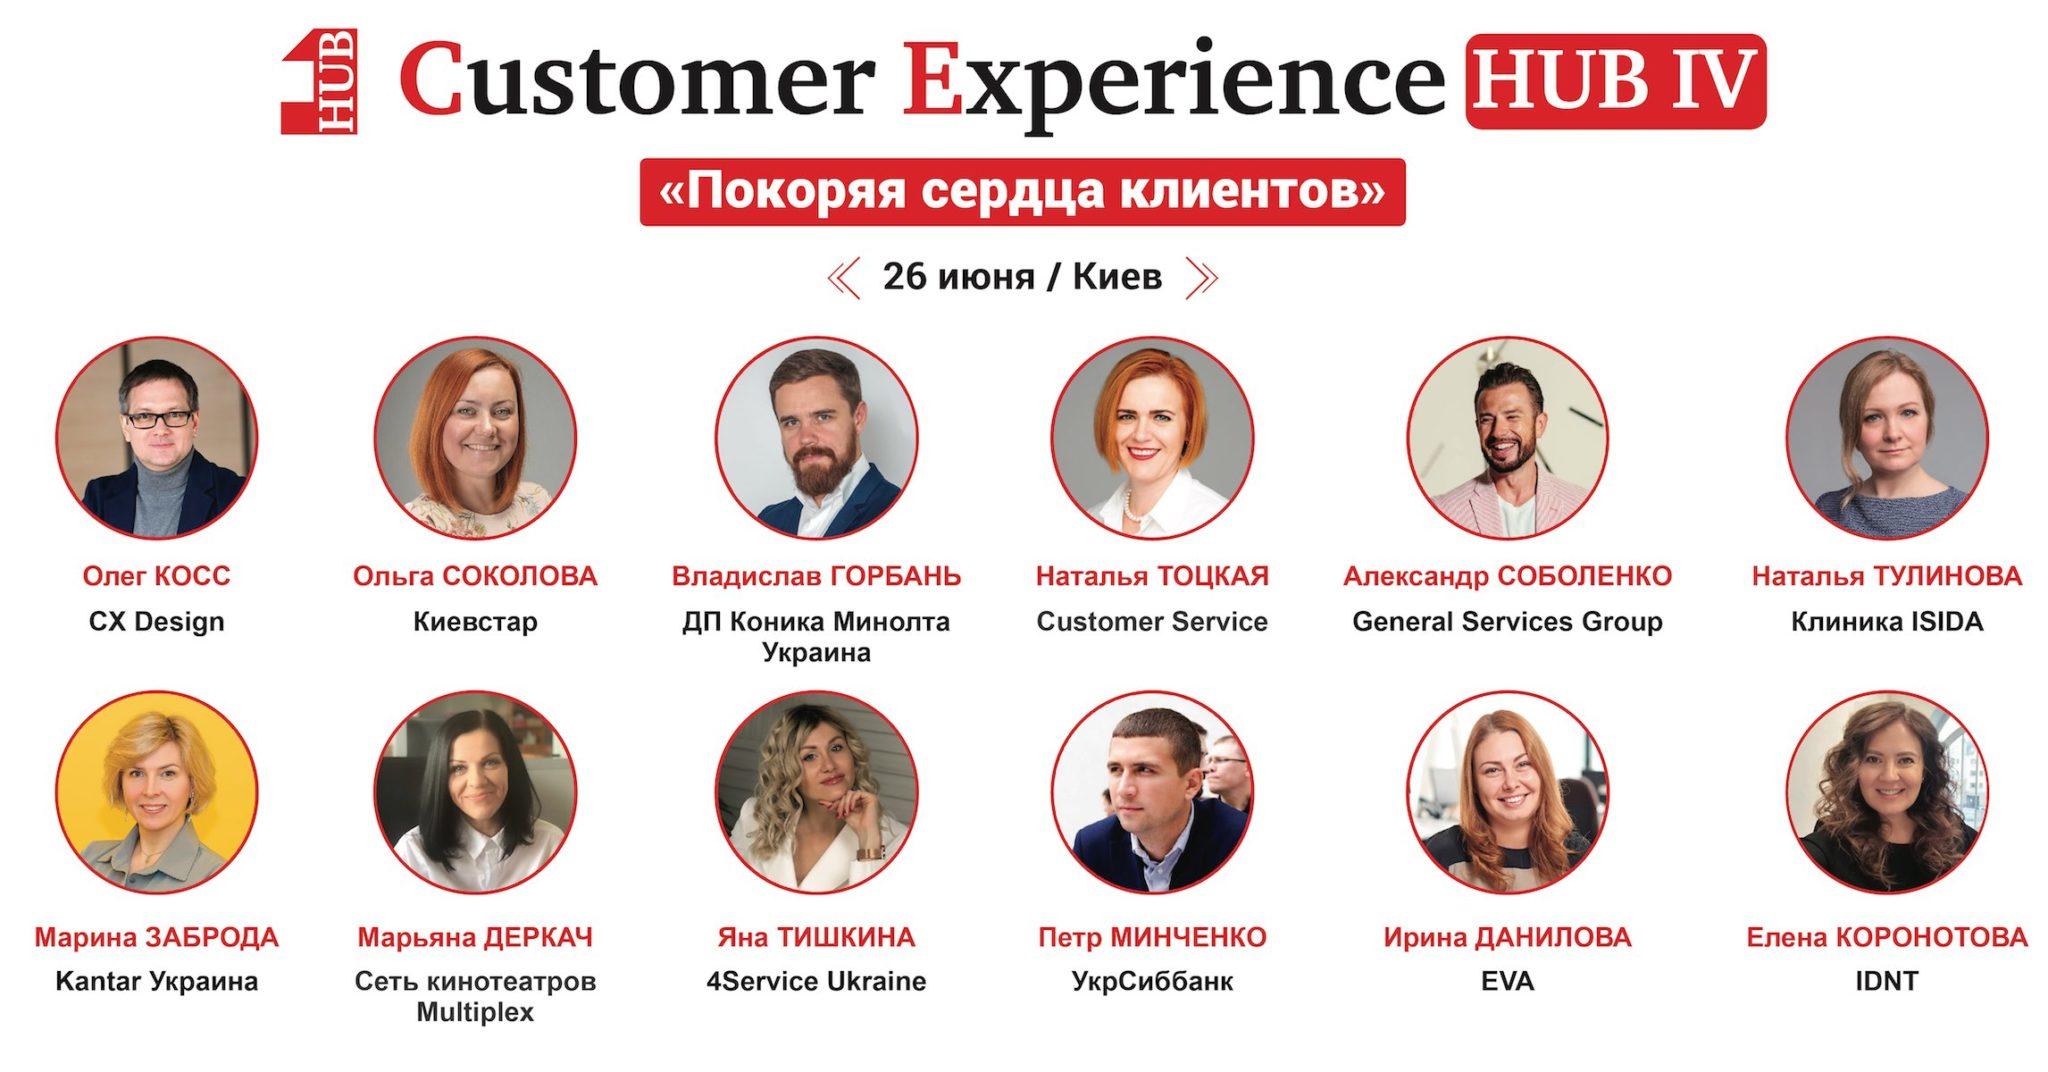 Customer Experience HUB «Покоряя сердца клиентов» (26 июня / Киев)